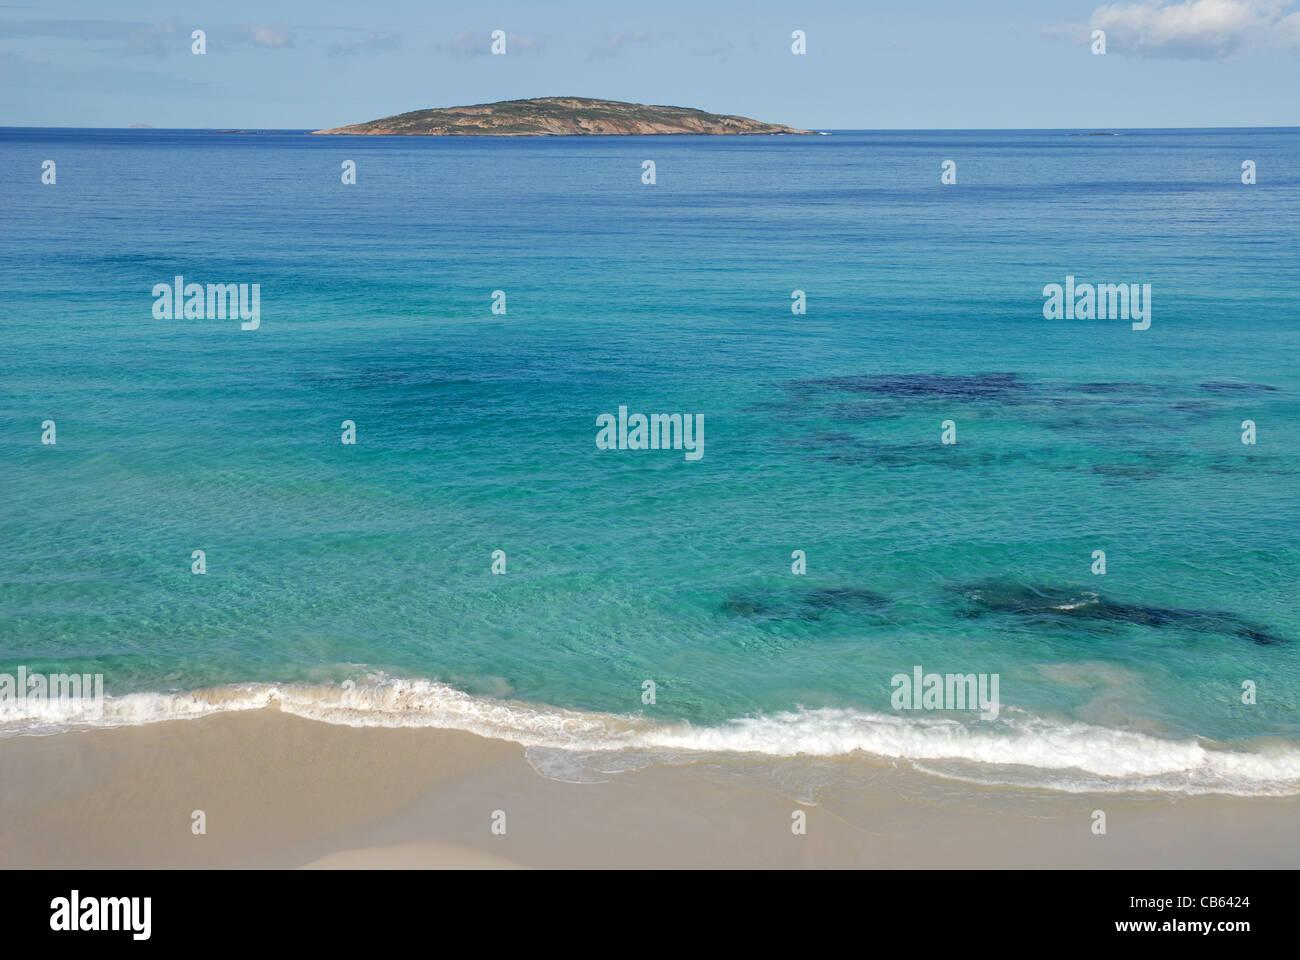 beach to sea & island view, Esperance, Western Australia, Australia - Stock Image